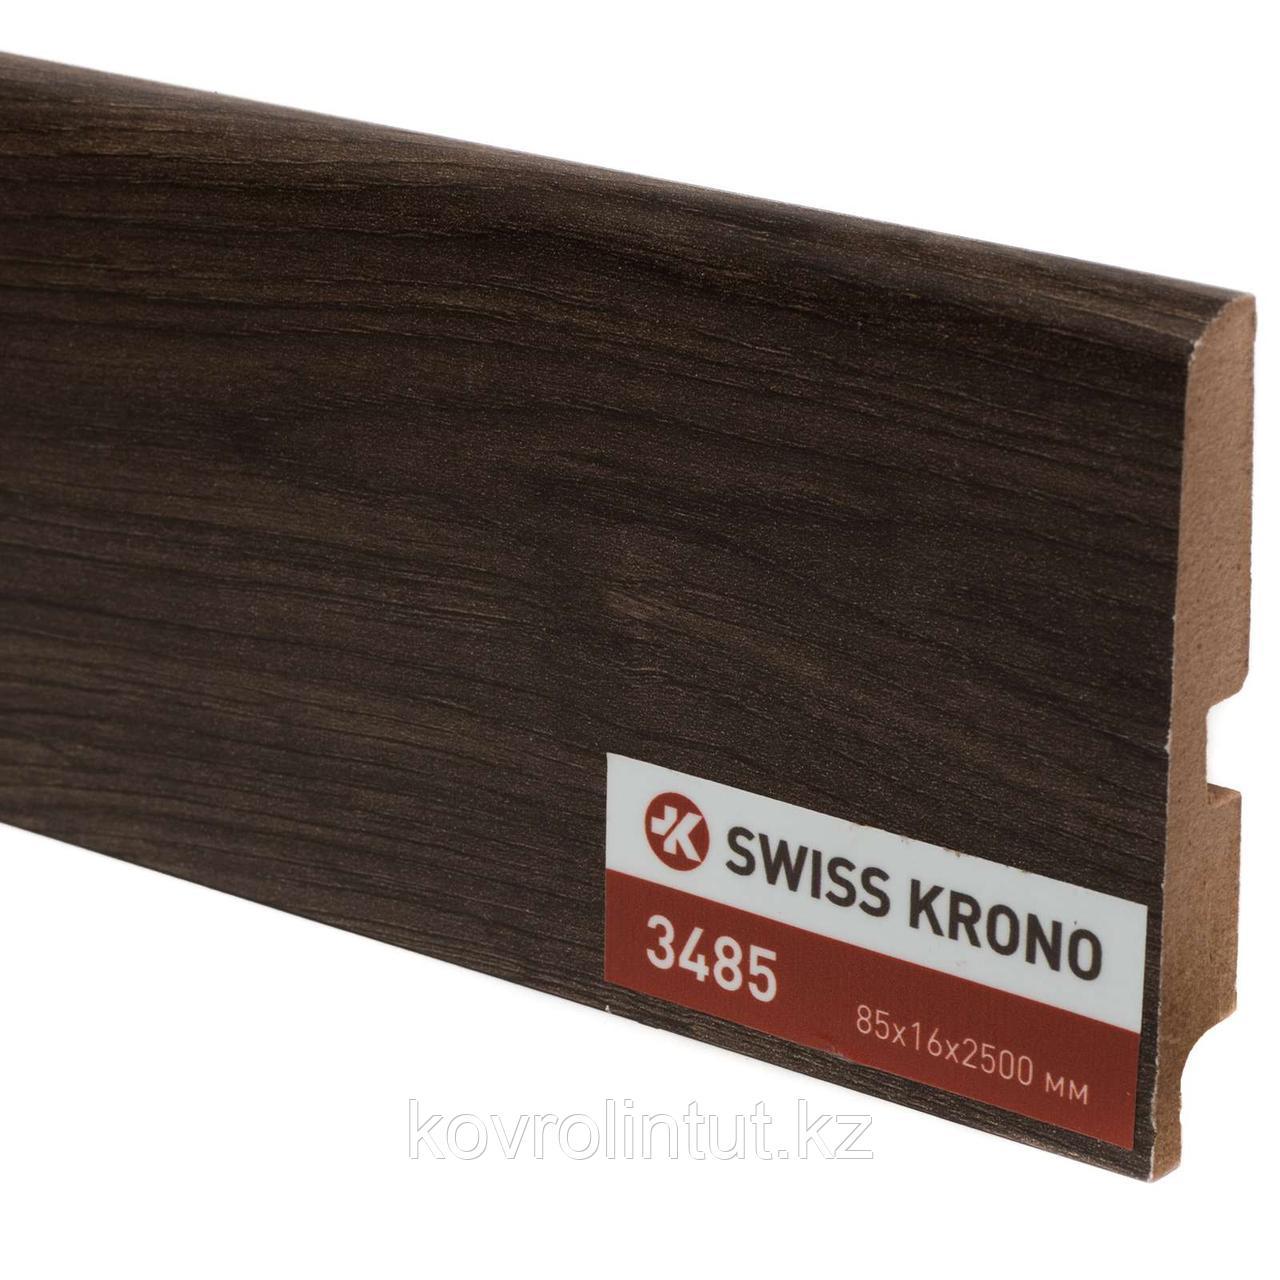 Плинтус Kronopol P85 3485, Boogie Elm, 2500х85х16мм, 9шт/уп